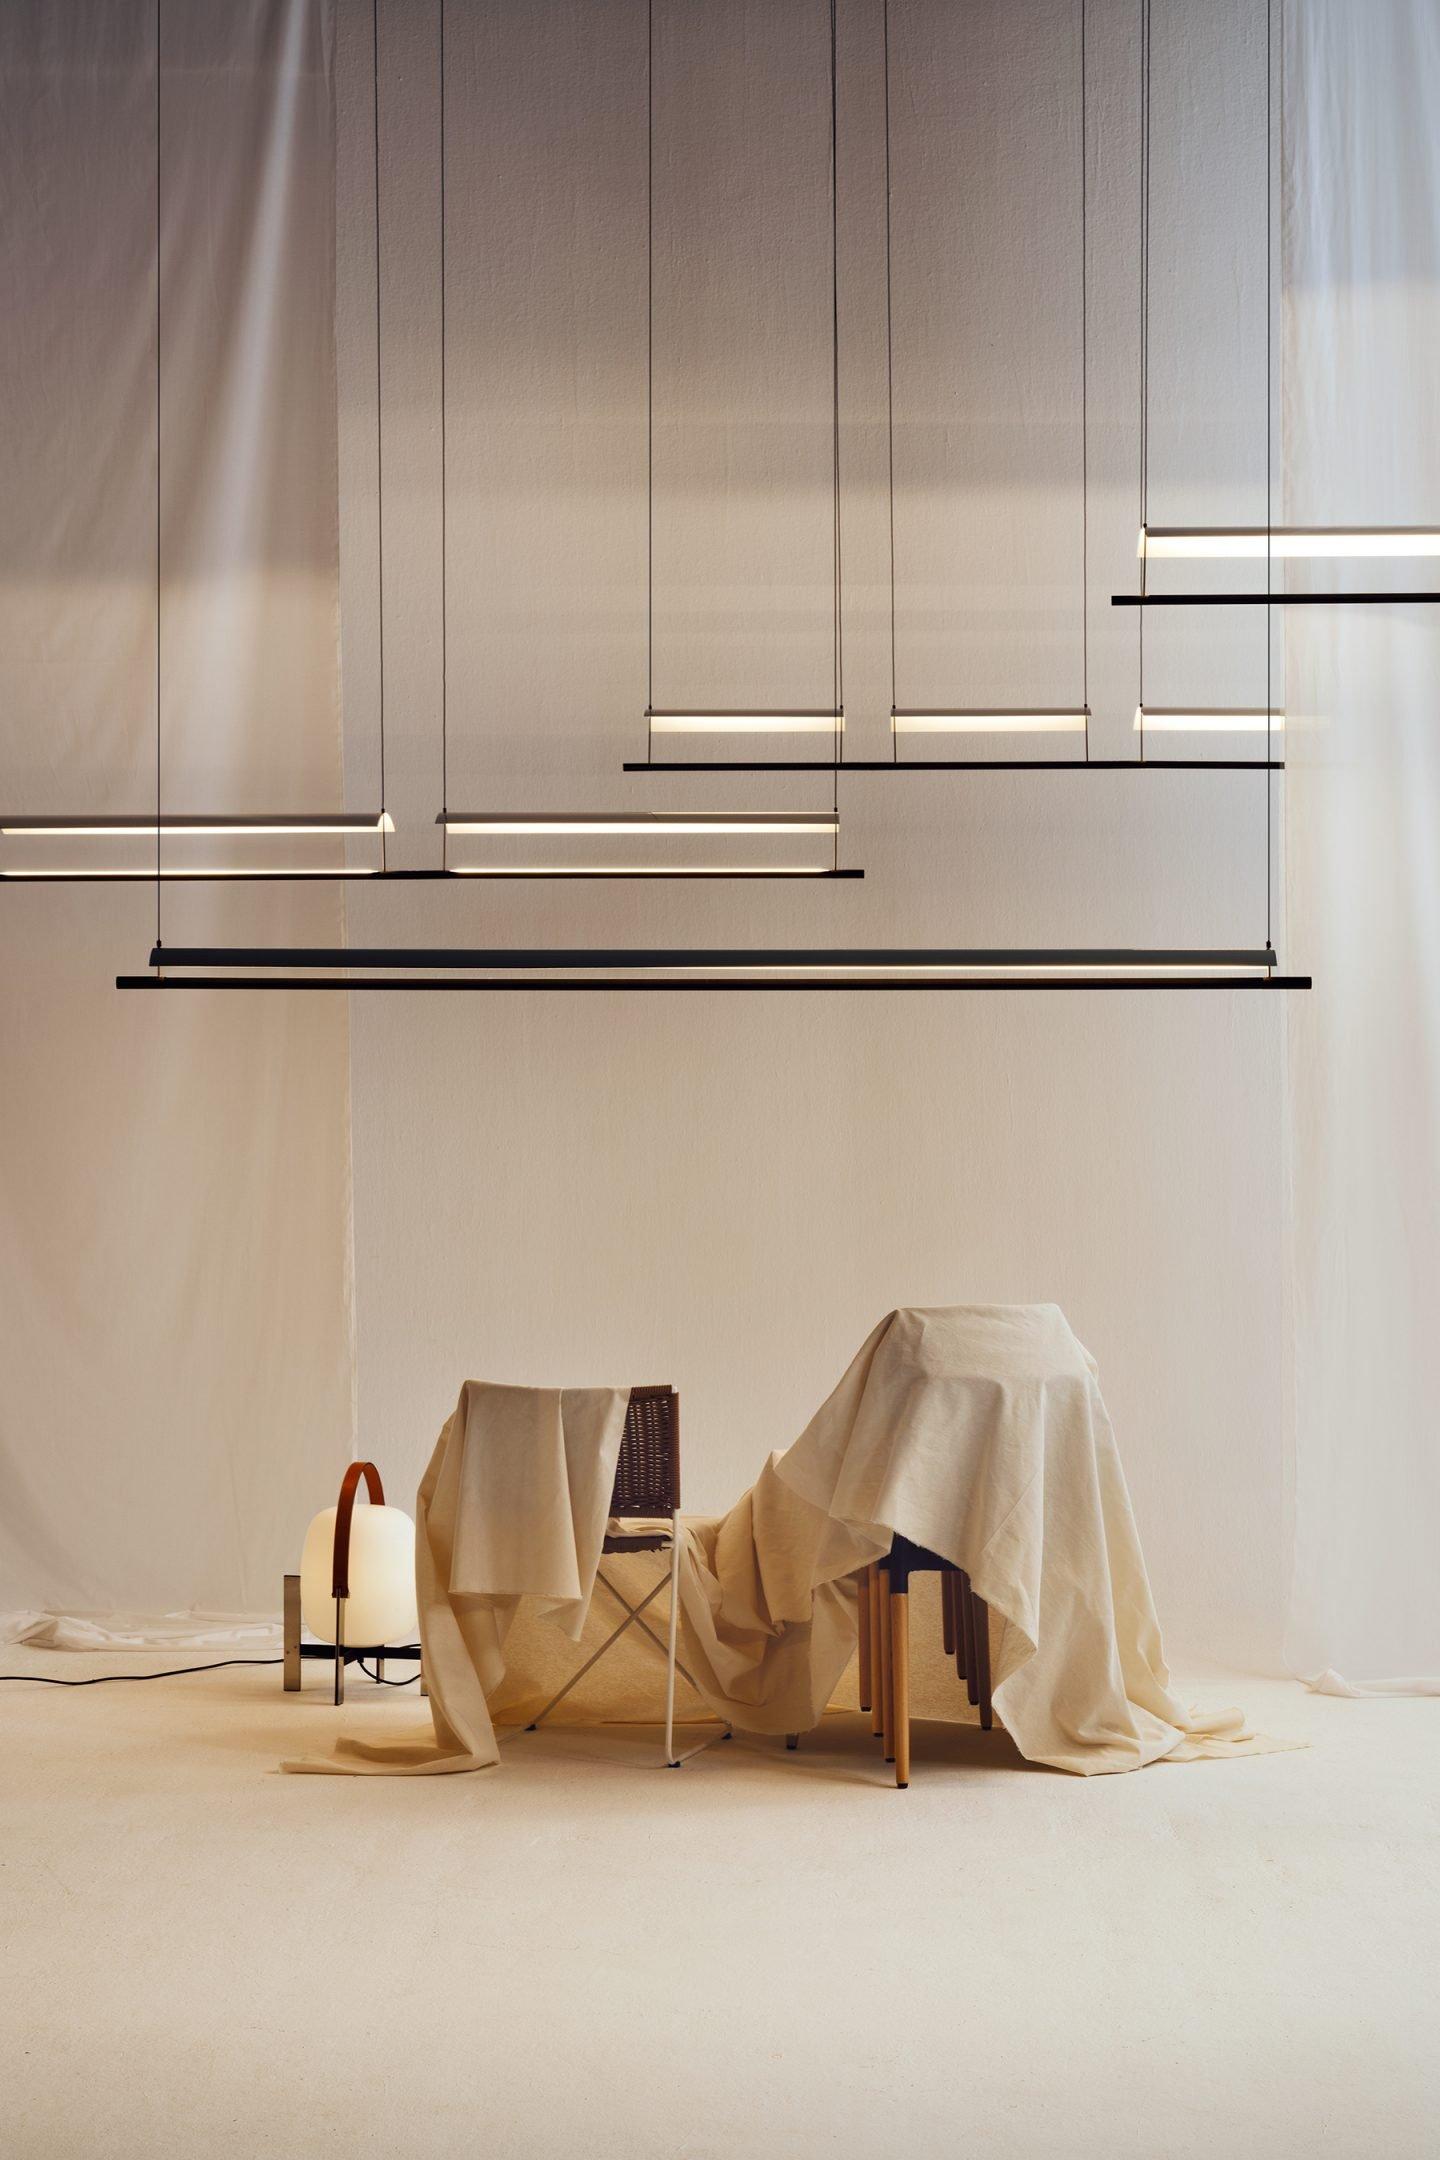 IGNANT-Design-SantaCole-AntoniArola-Lamina-16